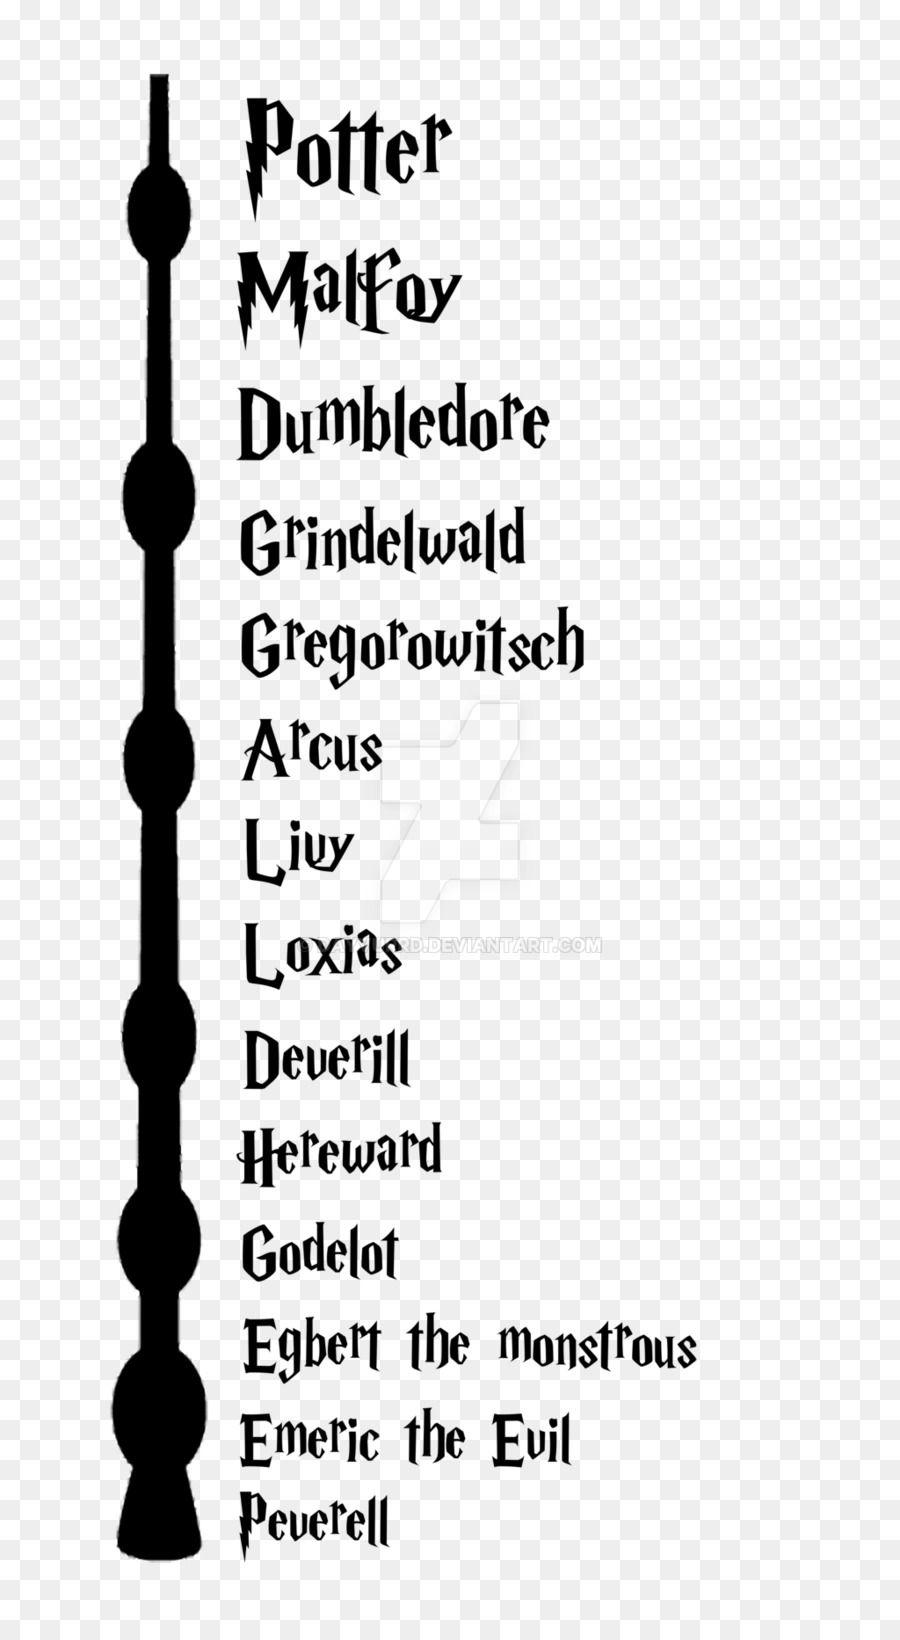 Albus Dumbledore Lord Voldemort Draco Malfoy Gellert